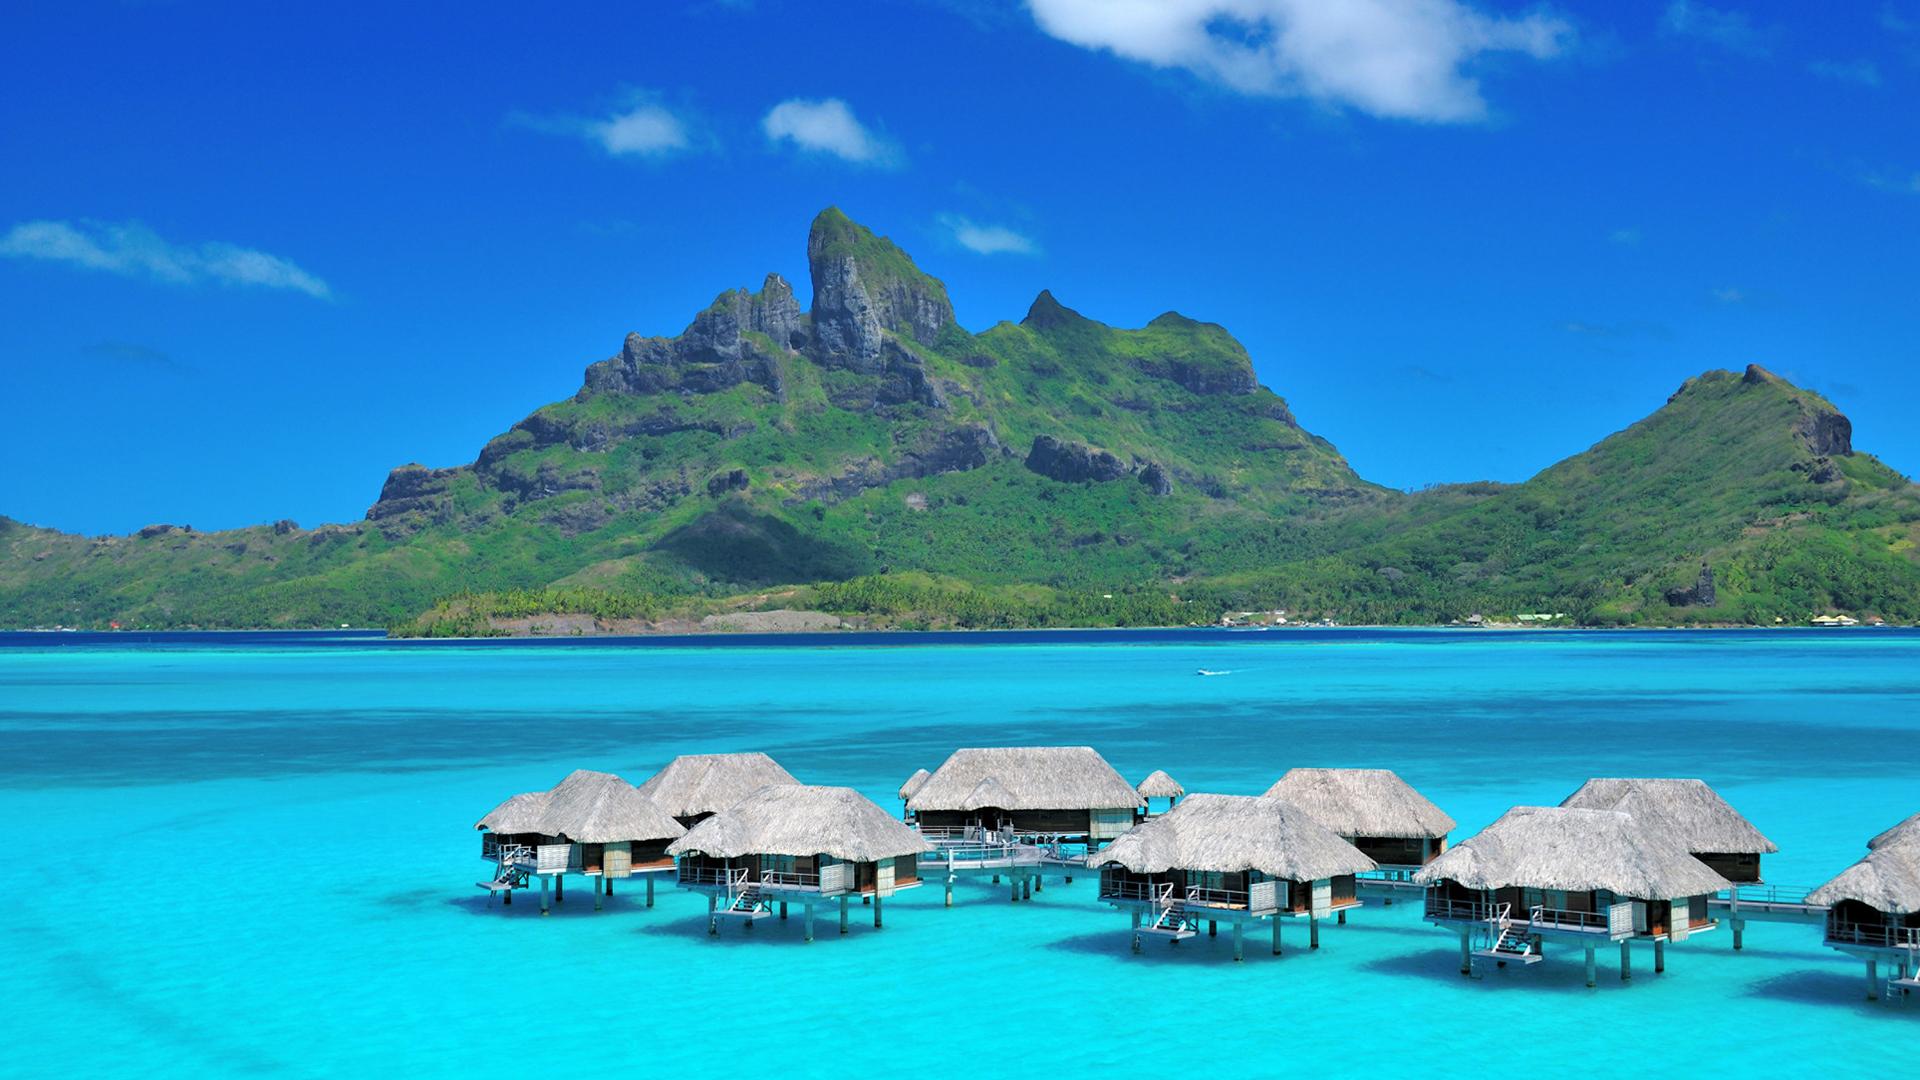 St Regis Resort, Bora Bora